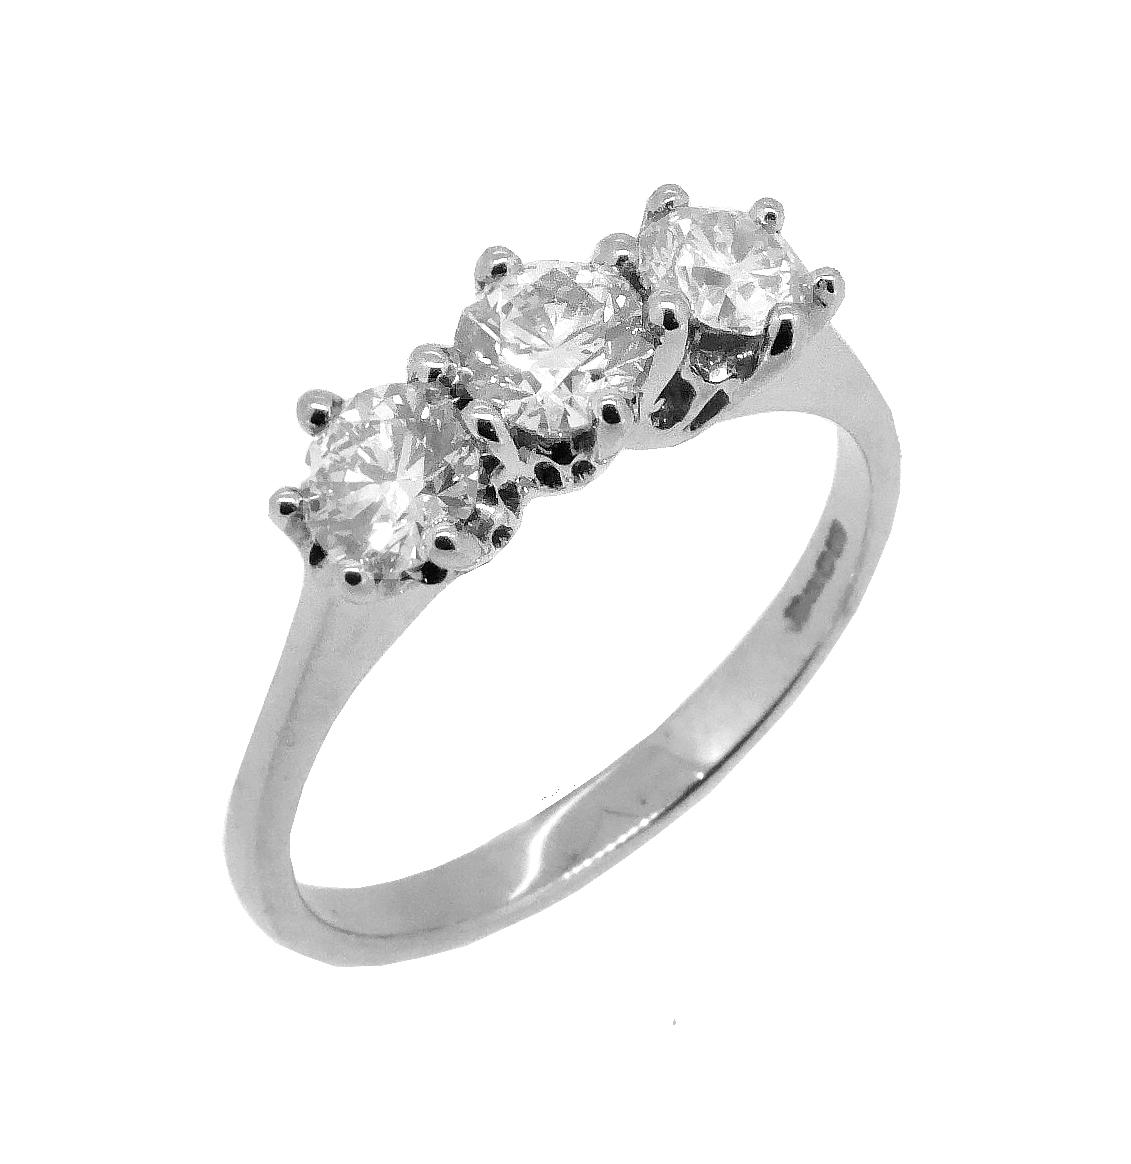 18k White Gold 3 Stone Brilliant Cut Diamond Ring